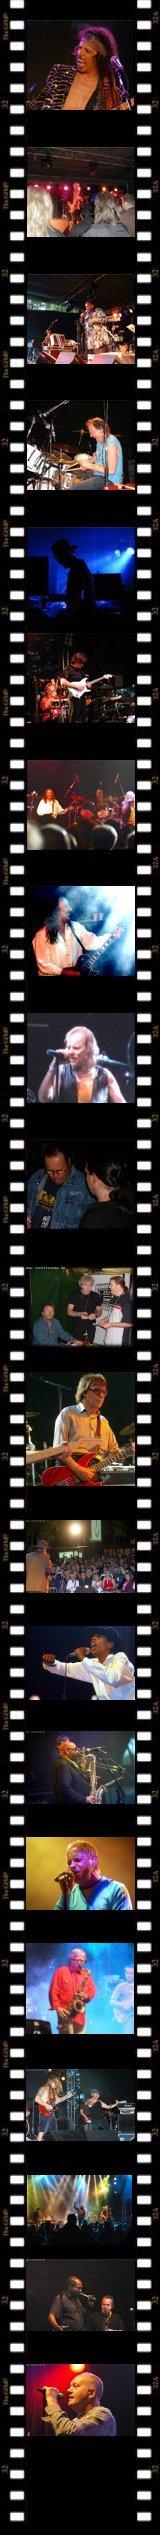 Rockfestival Filmstreifen